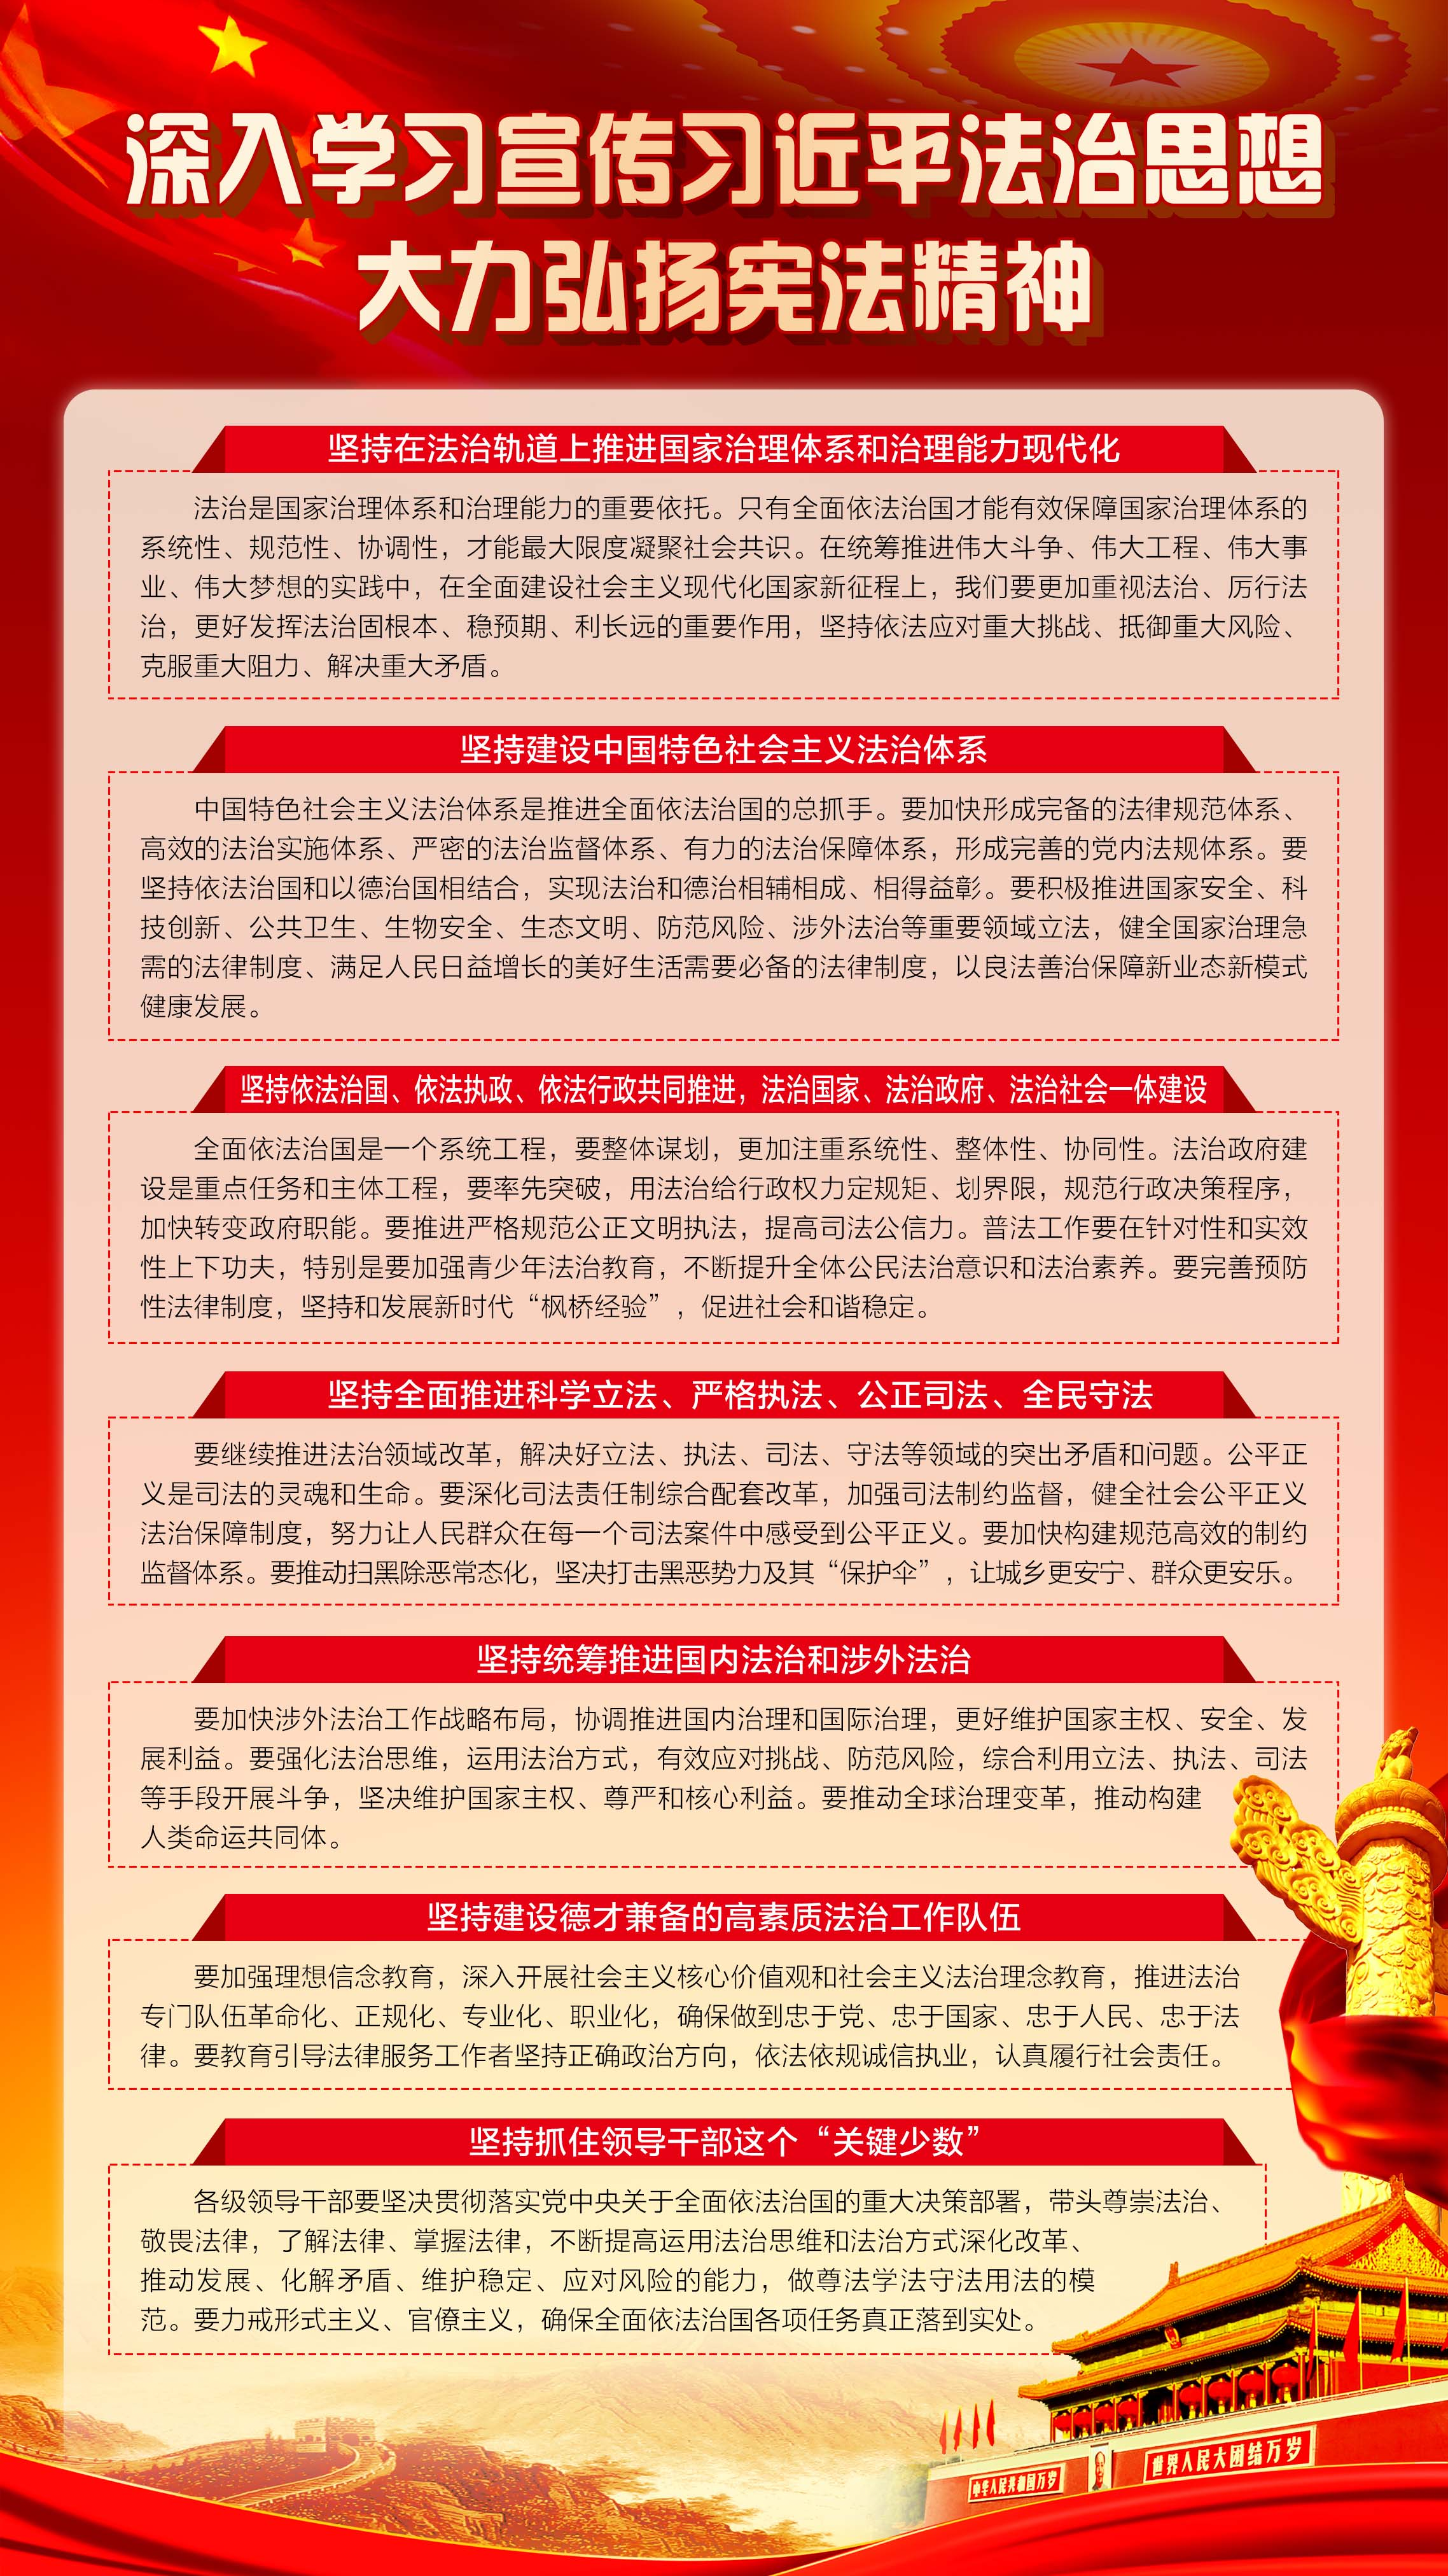 beplay体育下载安卓版 推荐进入国家宪法日宣传